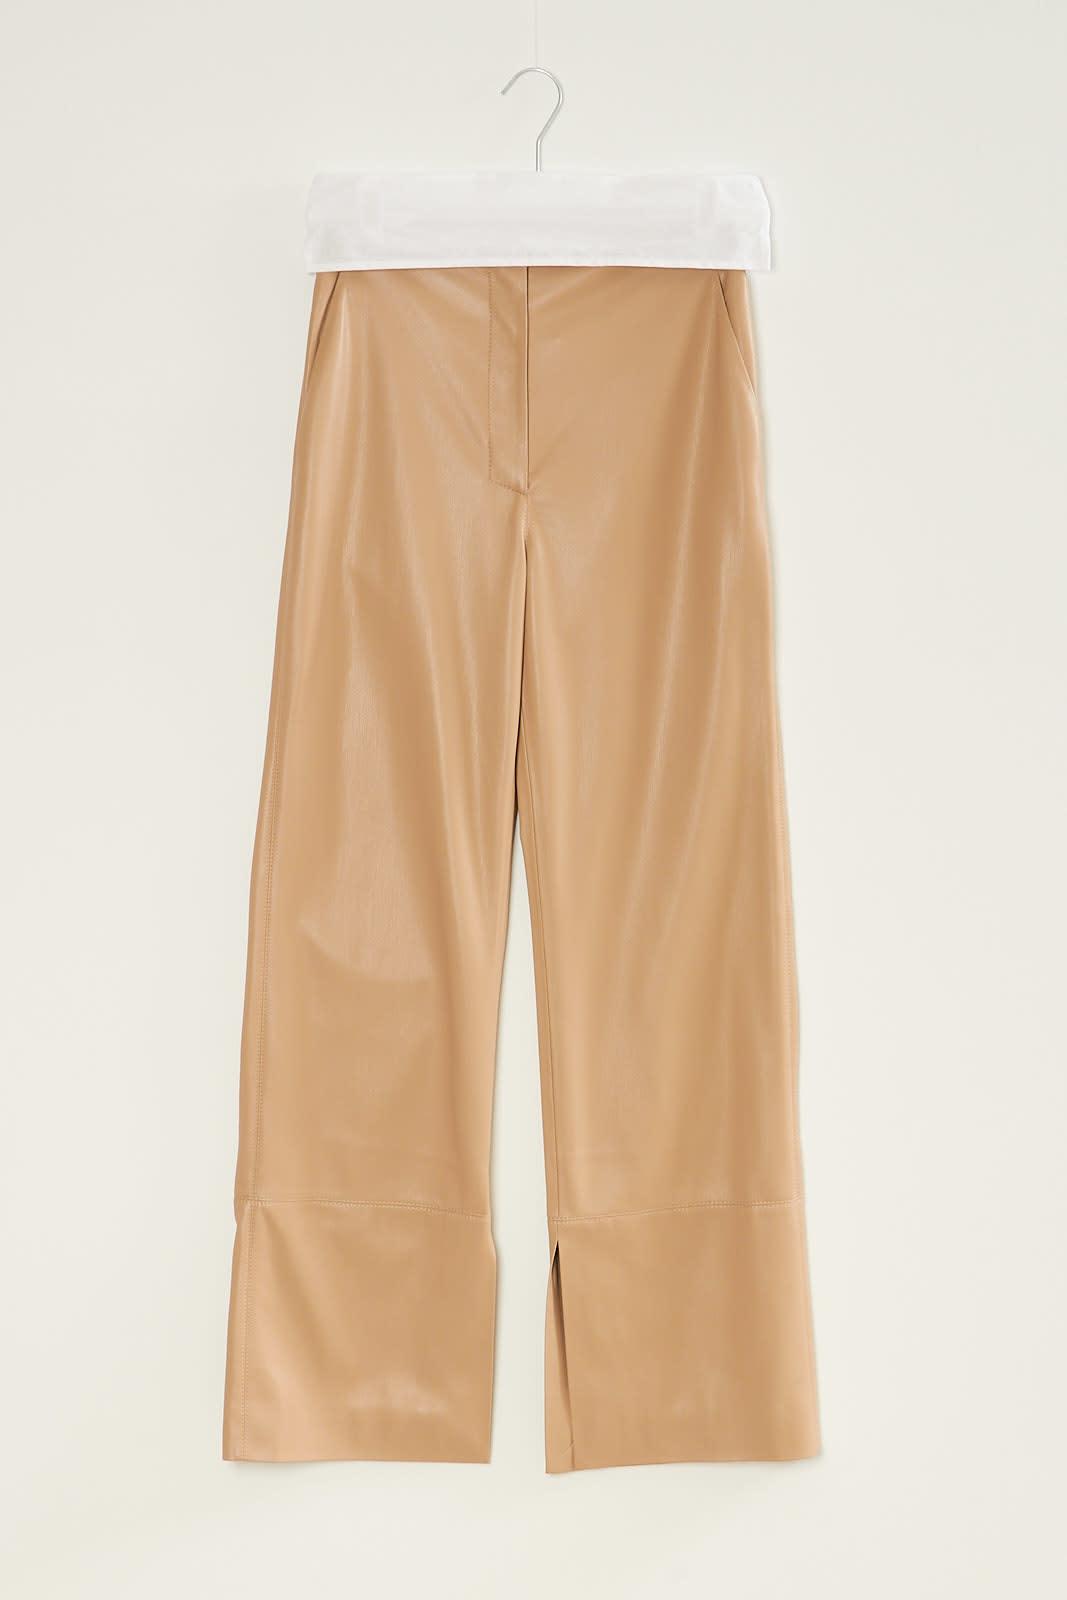 Nanushka - Rhyan vegan leather pants